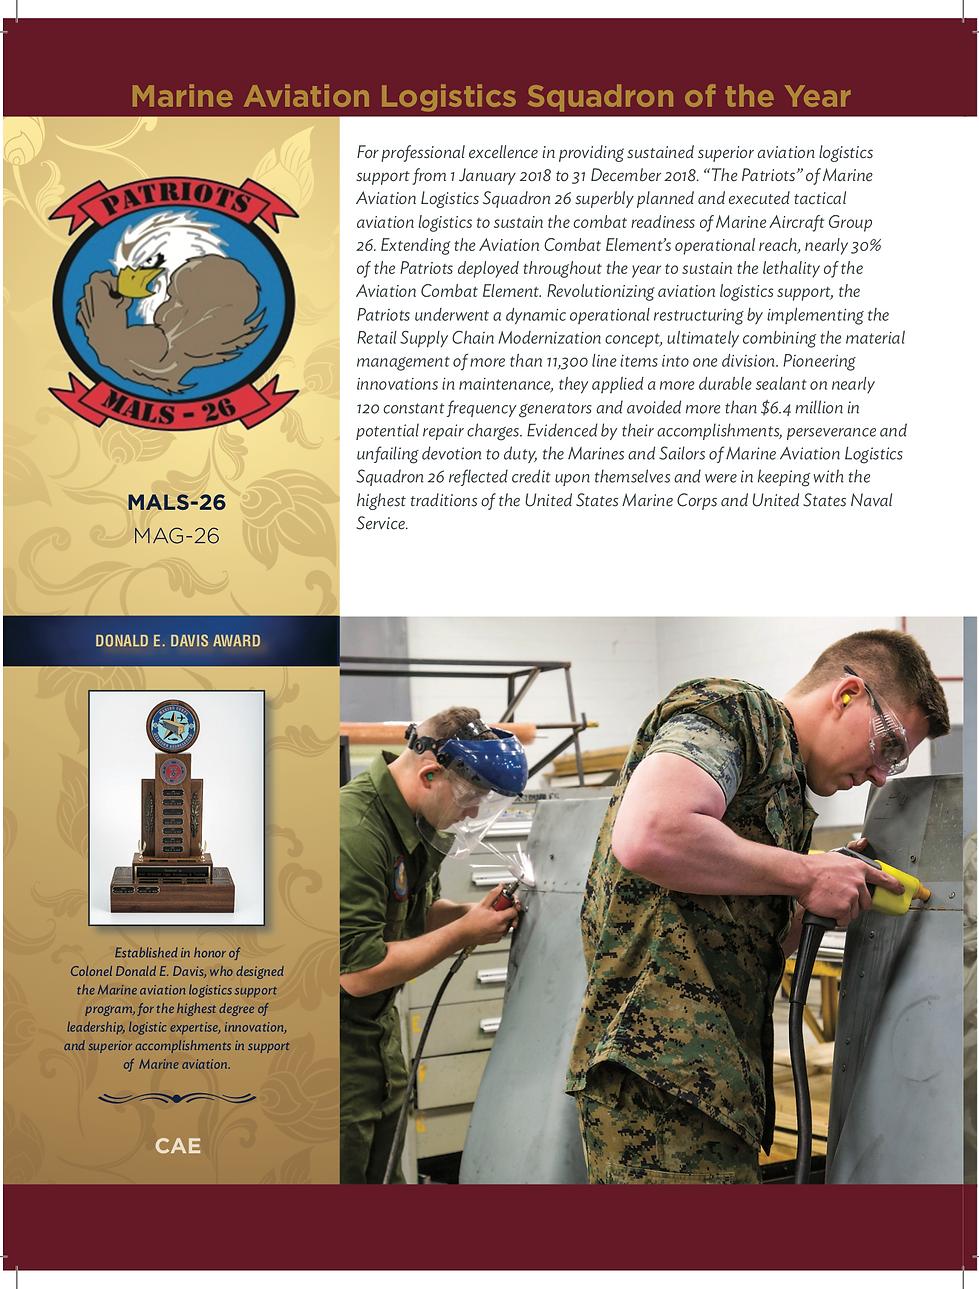 2019 Donald E. Davis Award